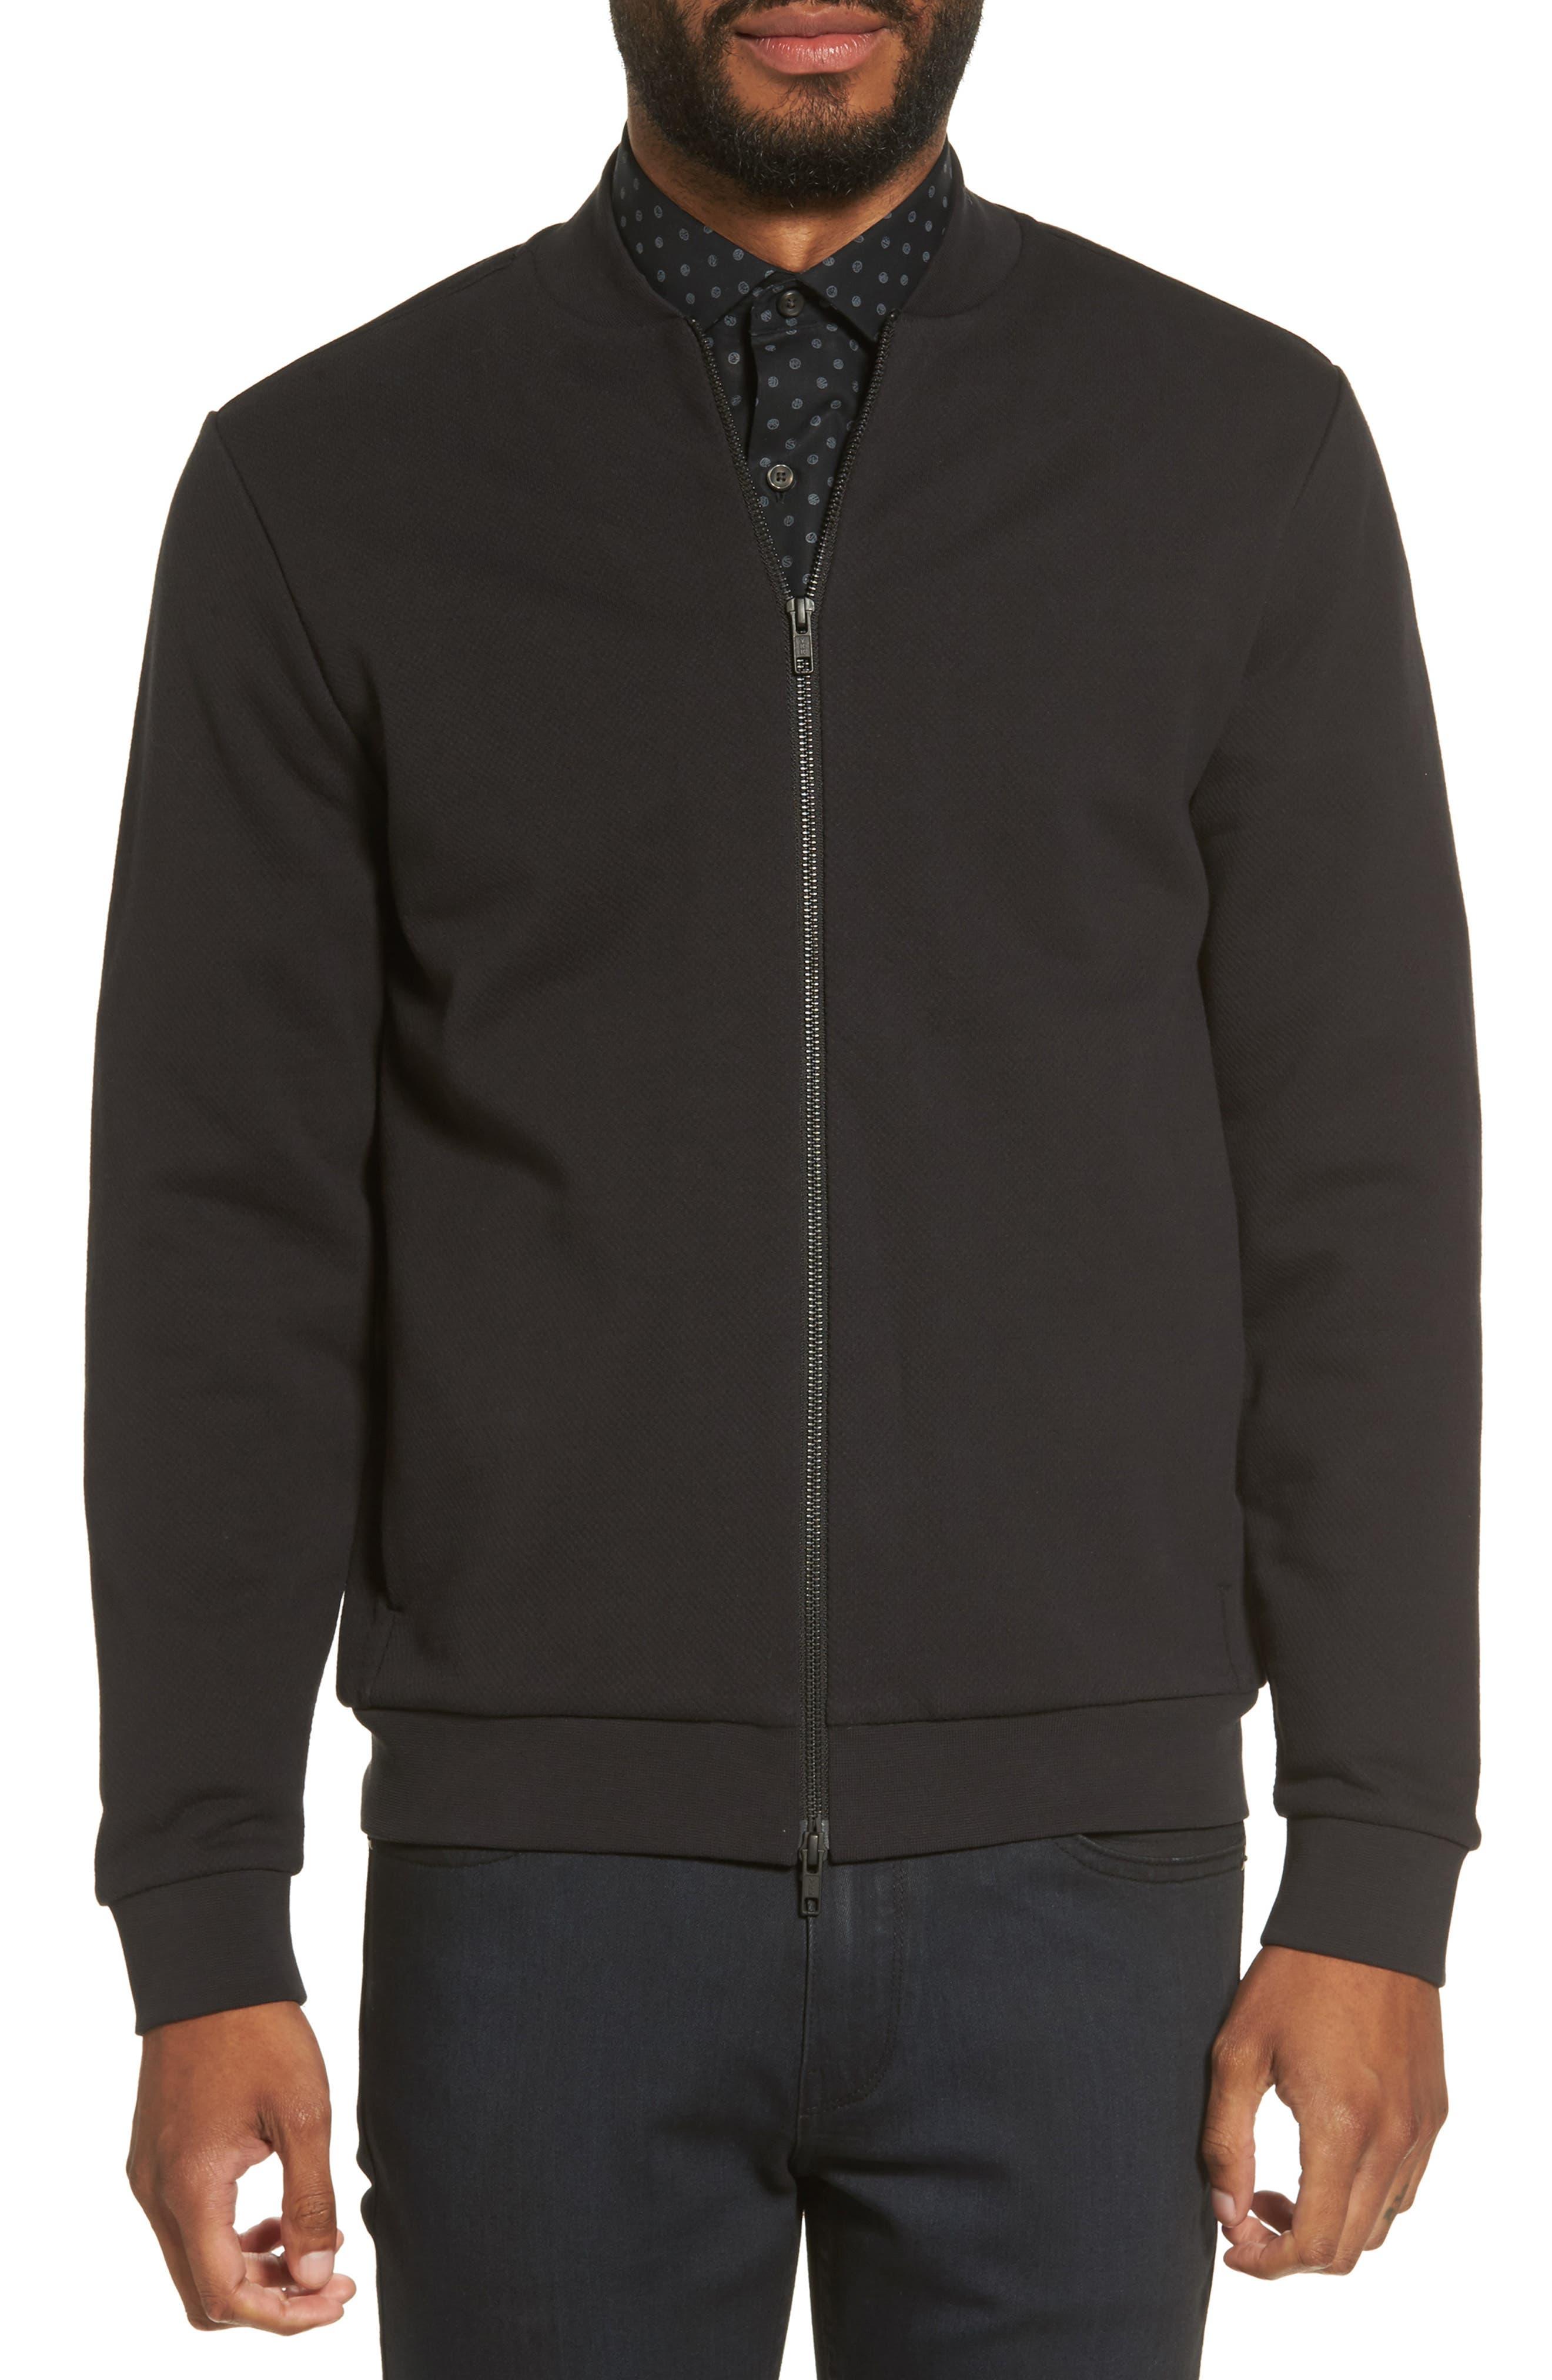 Zip Fleece Bomber Jacket,                             Main thumbnail 1, color,                             Black Caviar